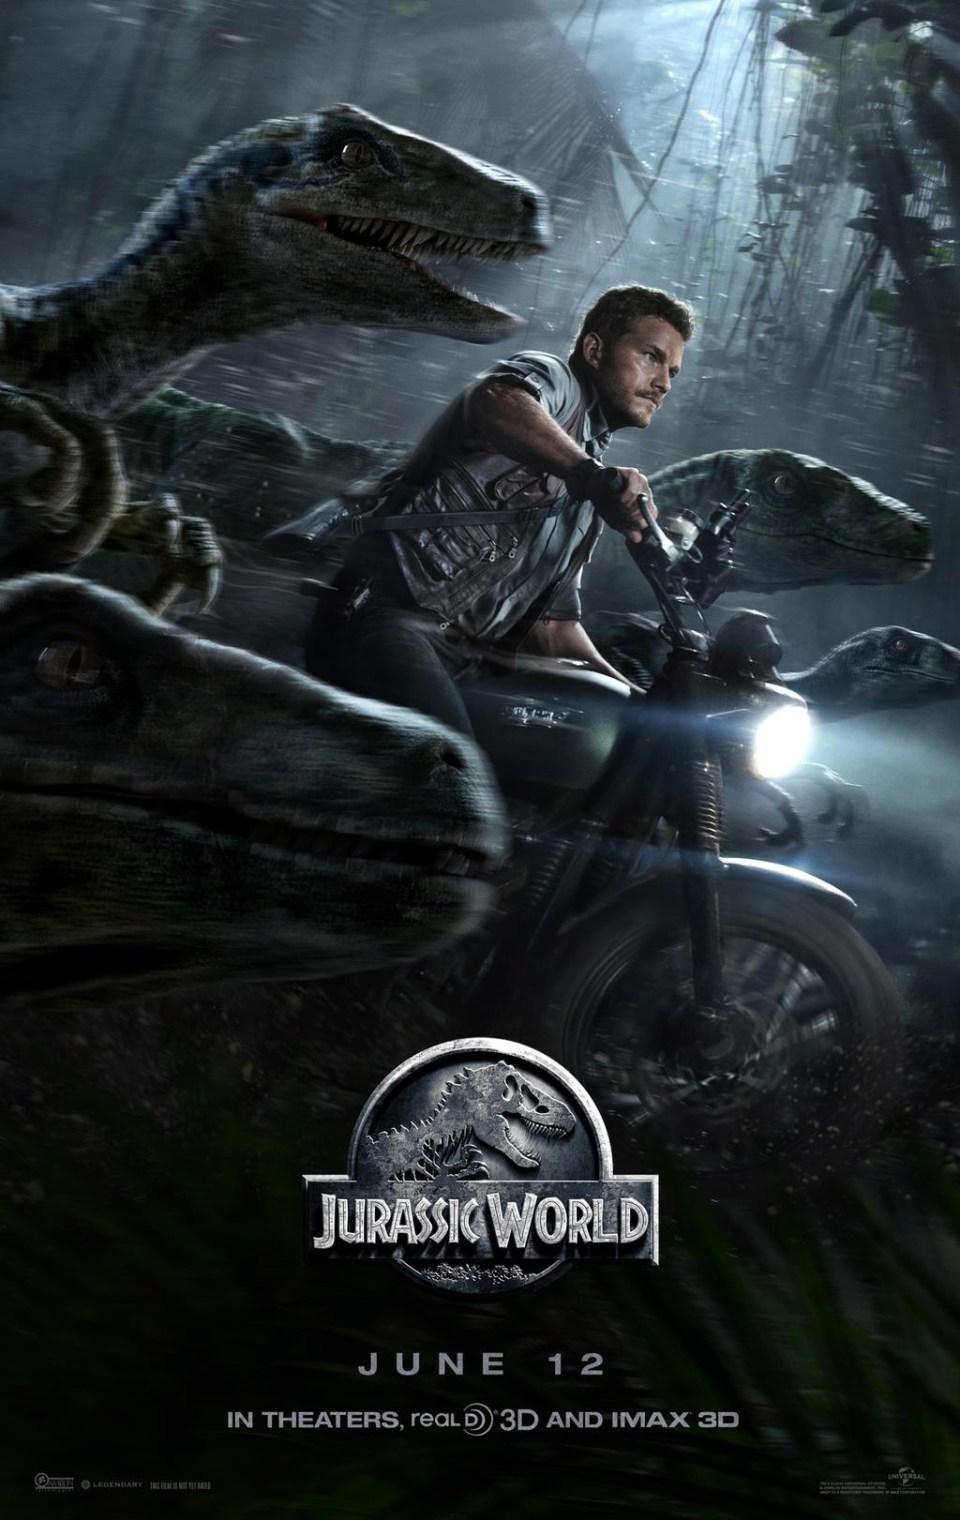 New Jurassic World Poster!